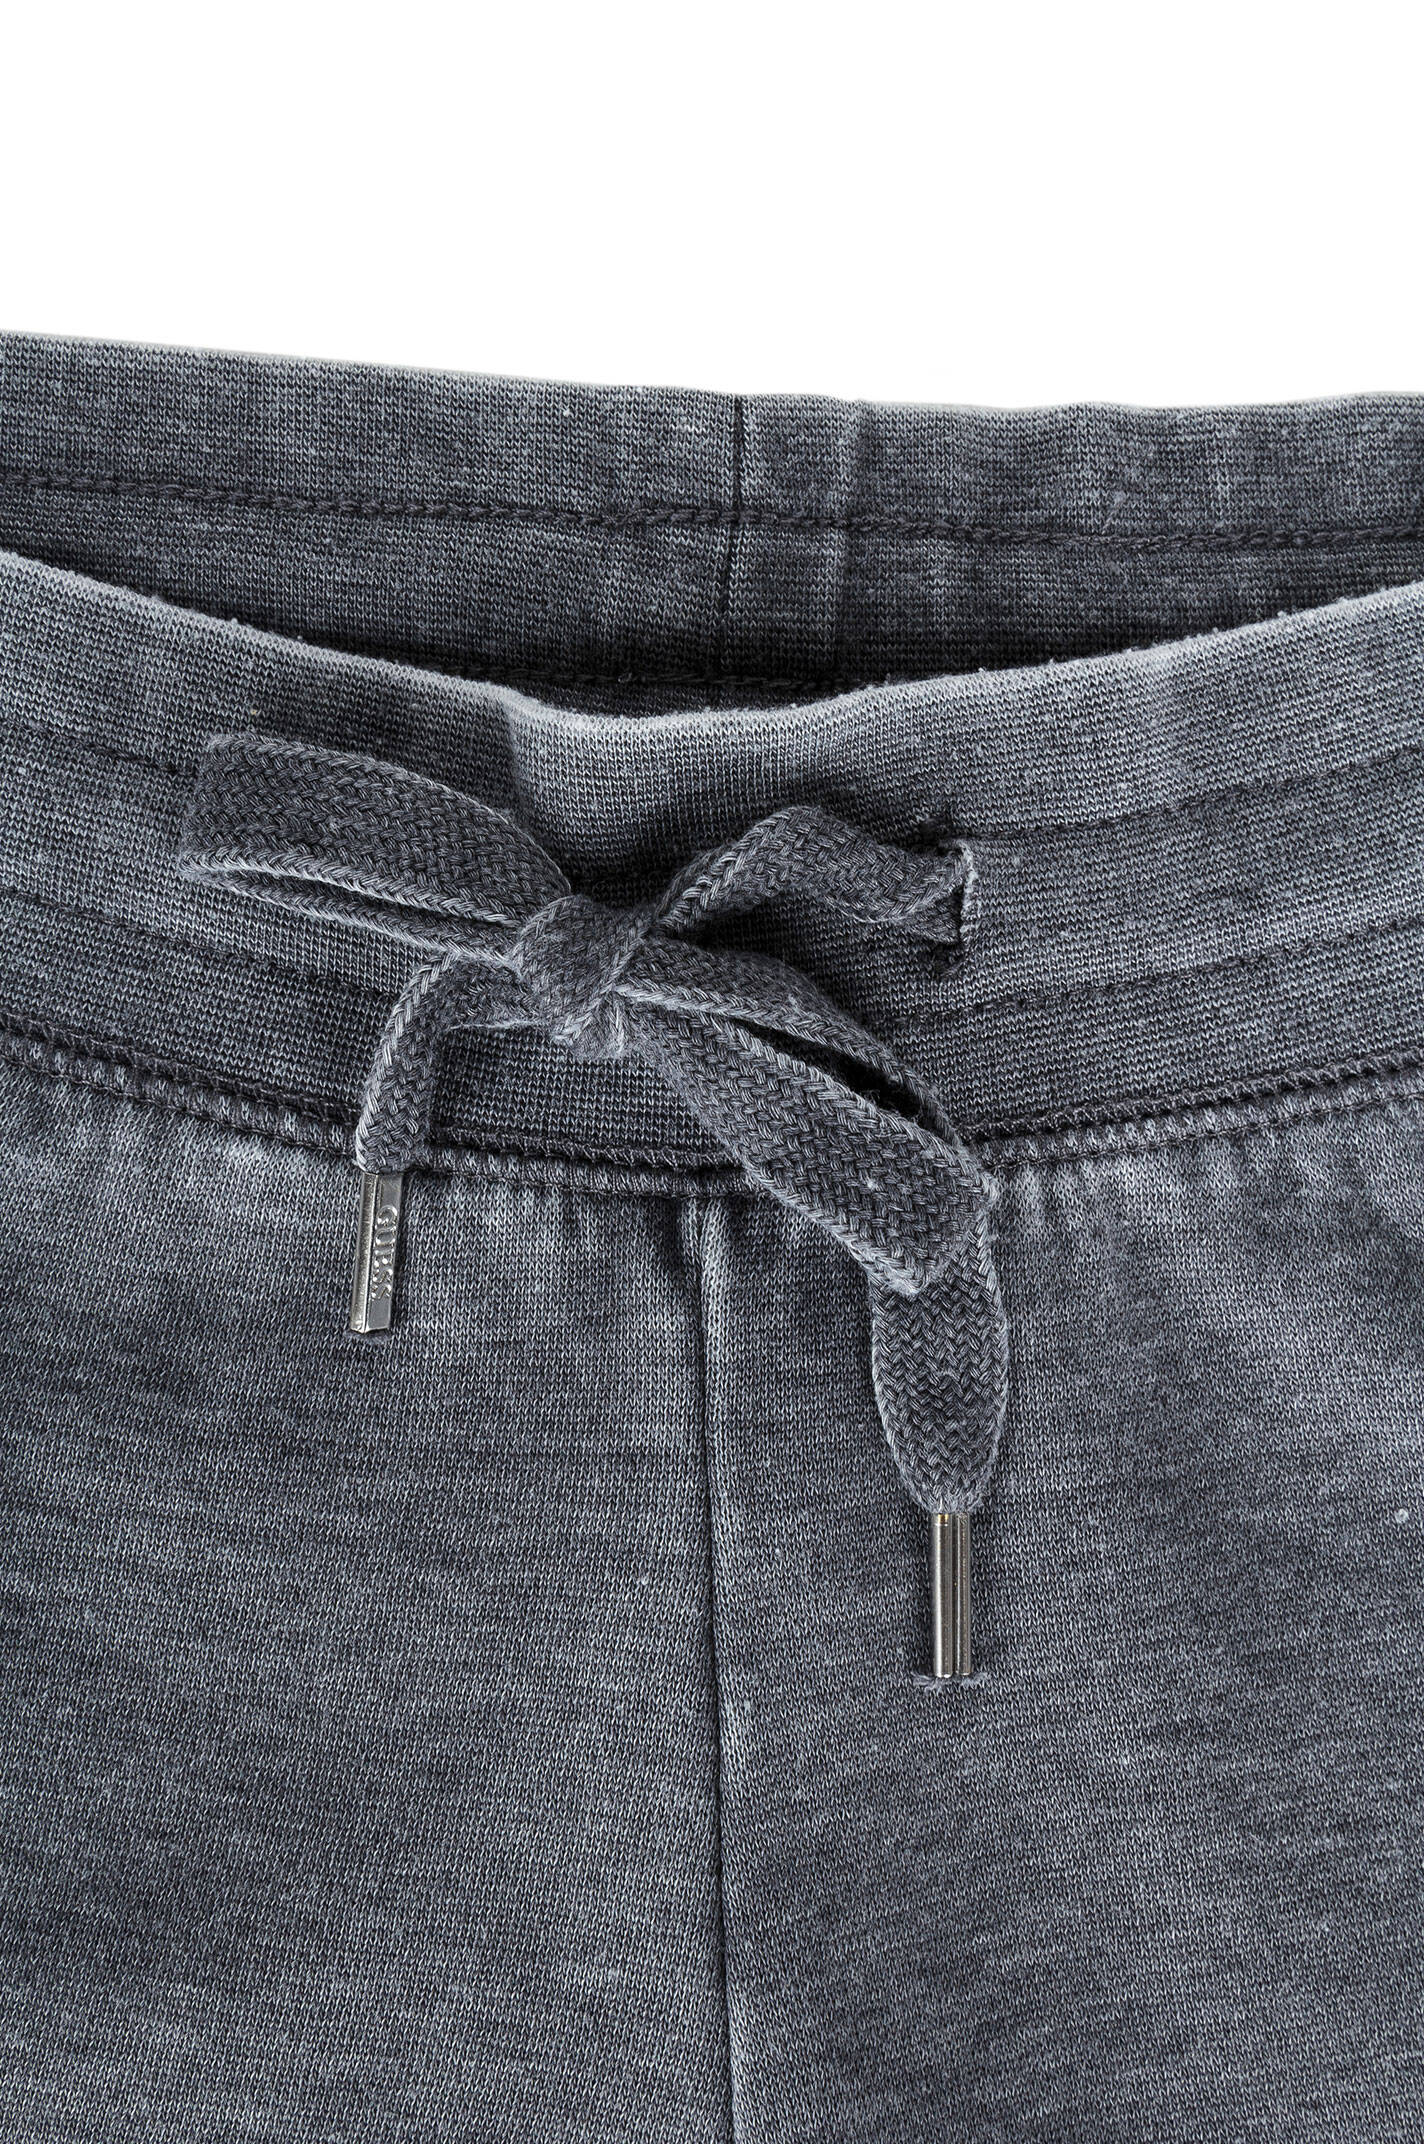 fded7361f5e92 Spodnie dresowe Guess Jeans